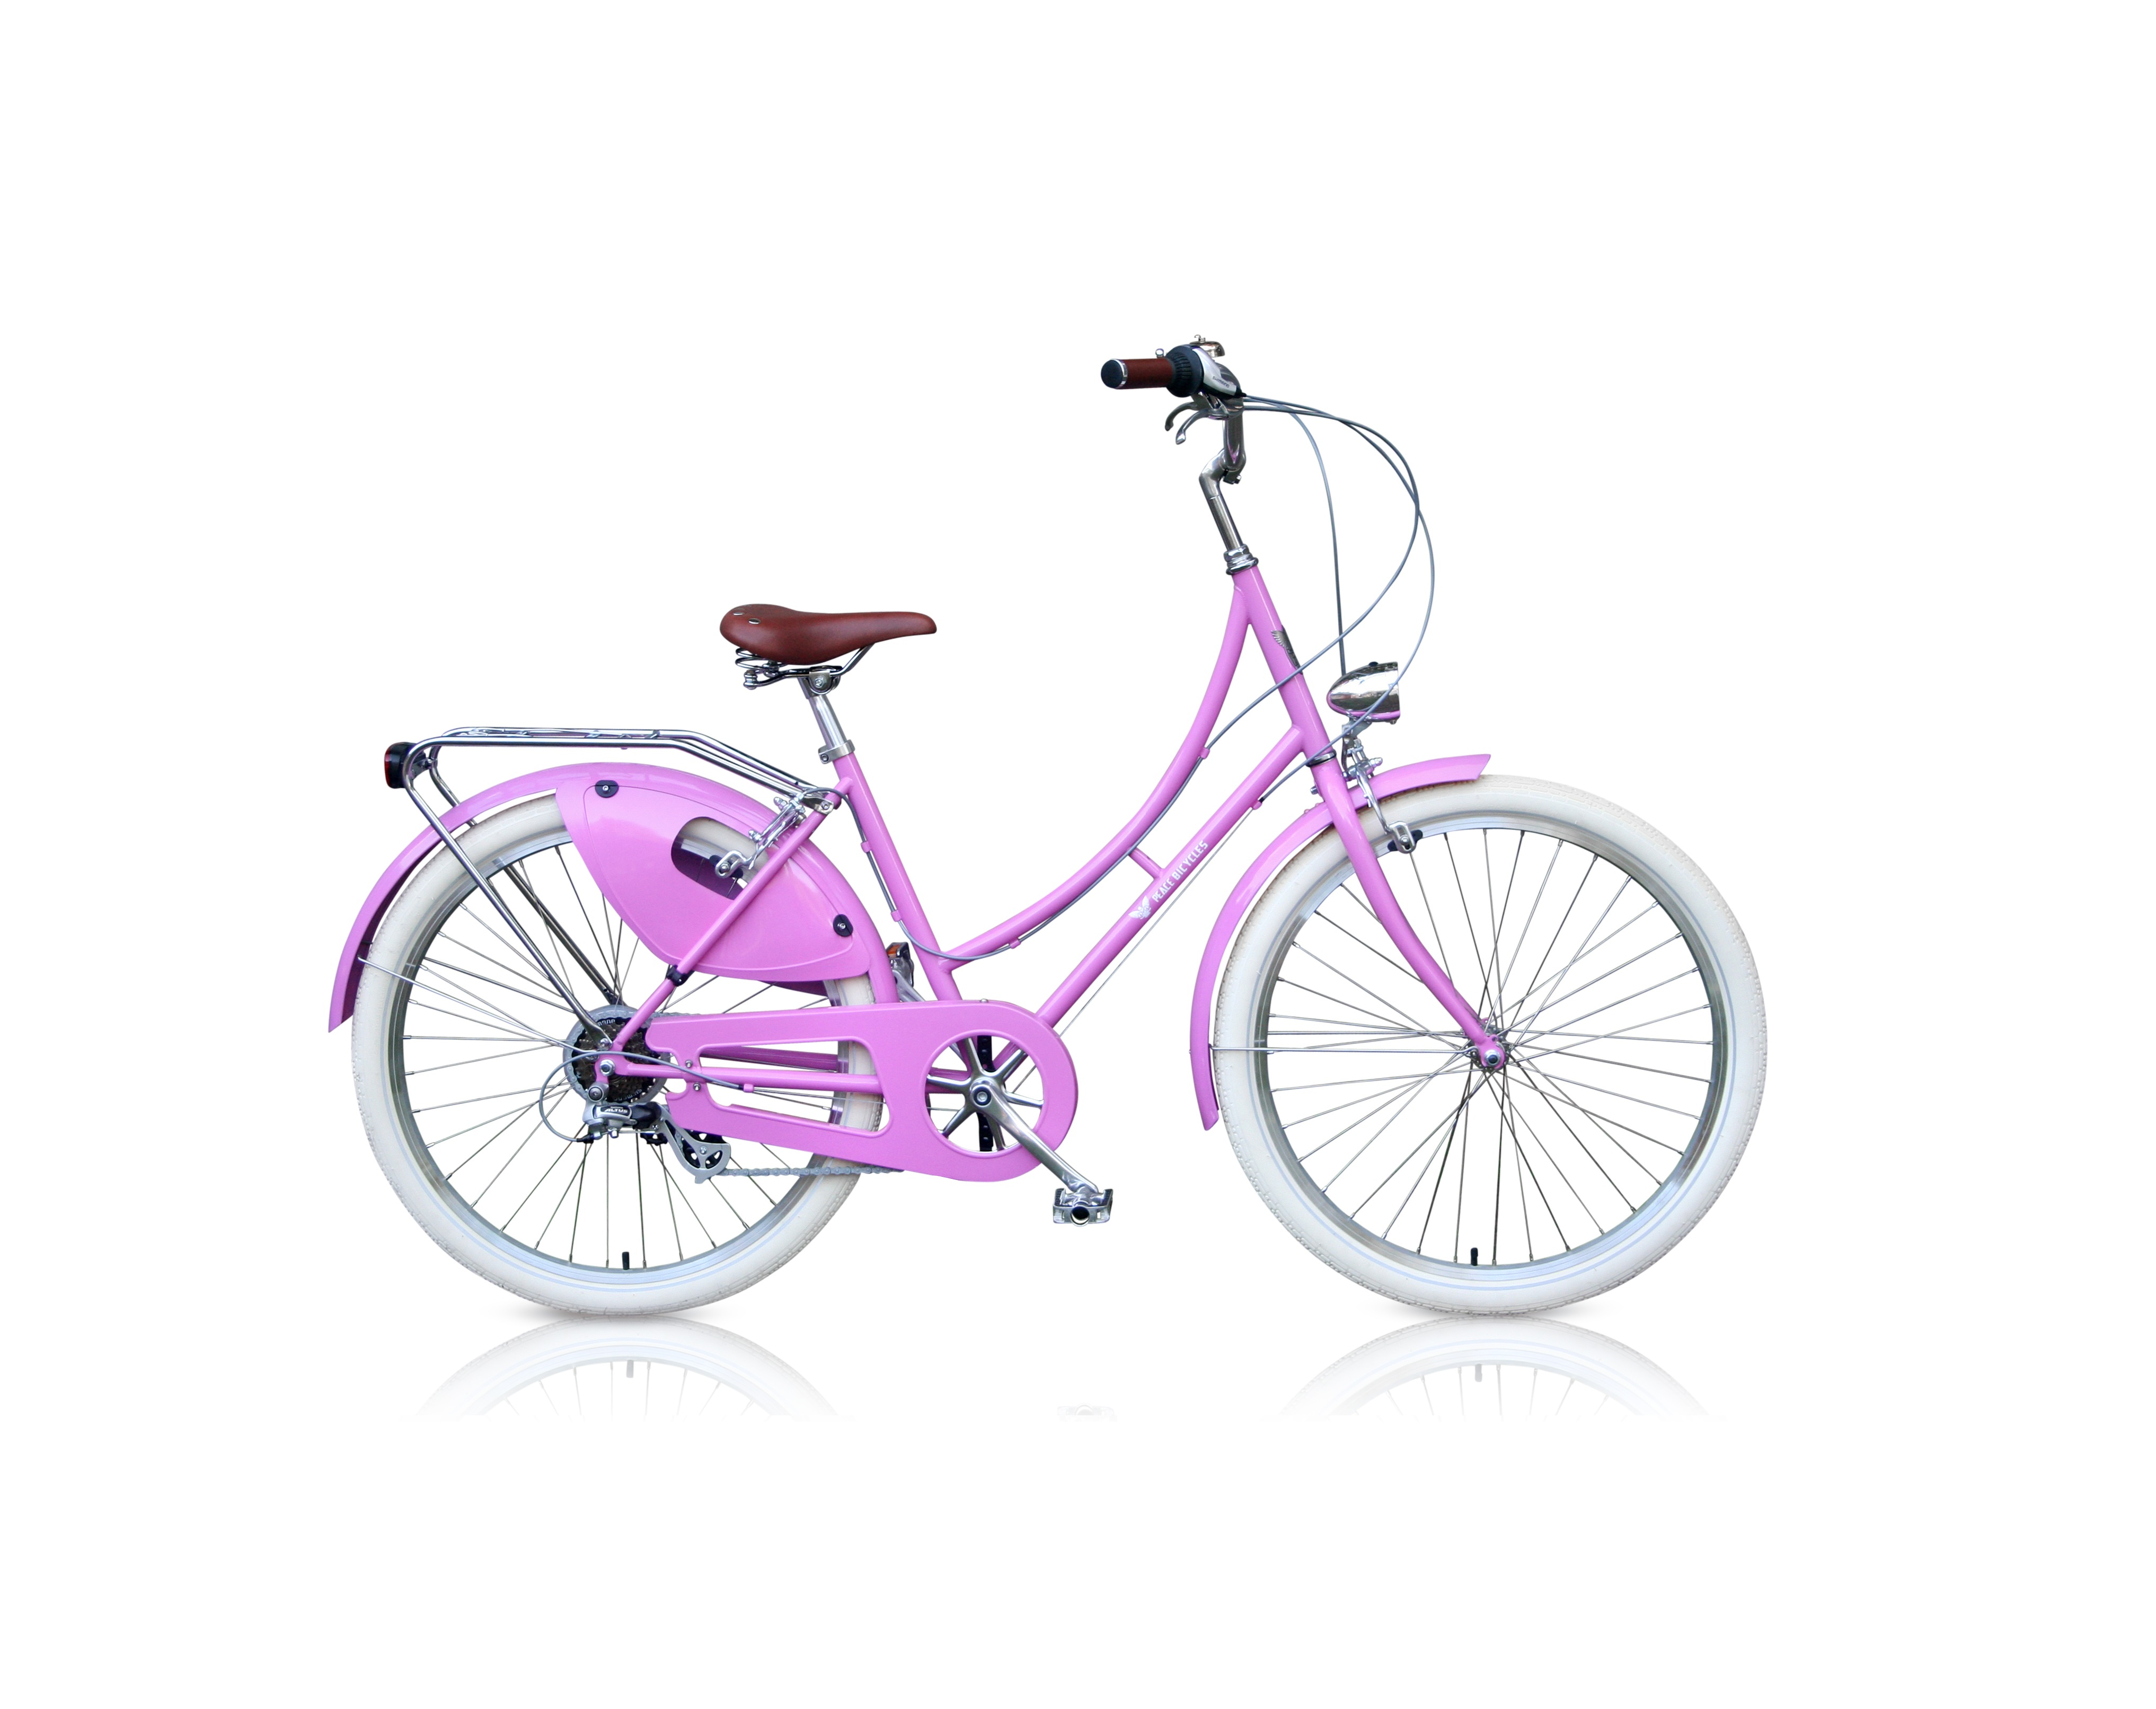 step-through-dutch-cruiser-city-bicycle-slider-1